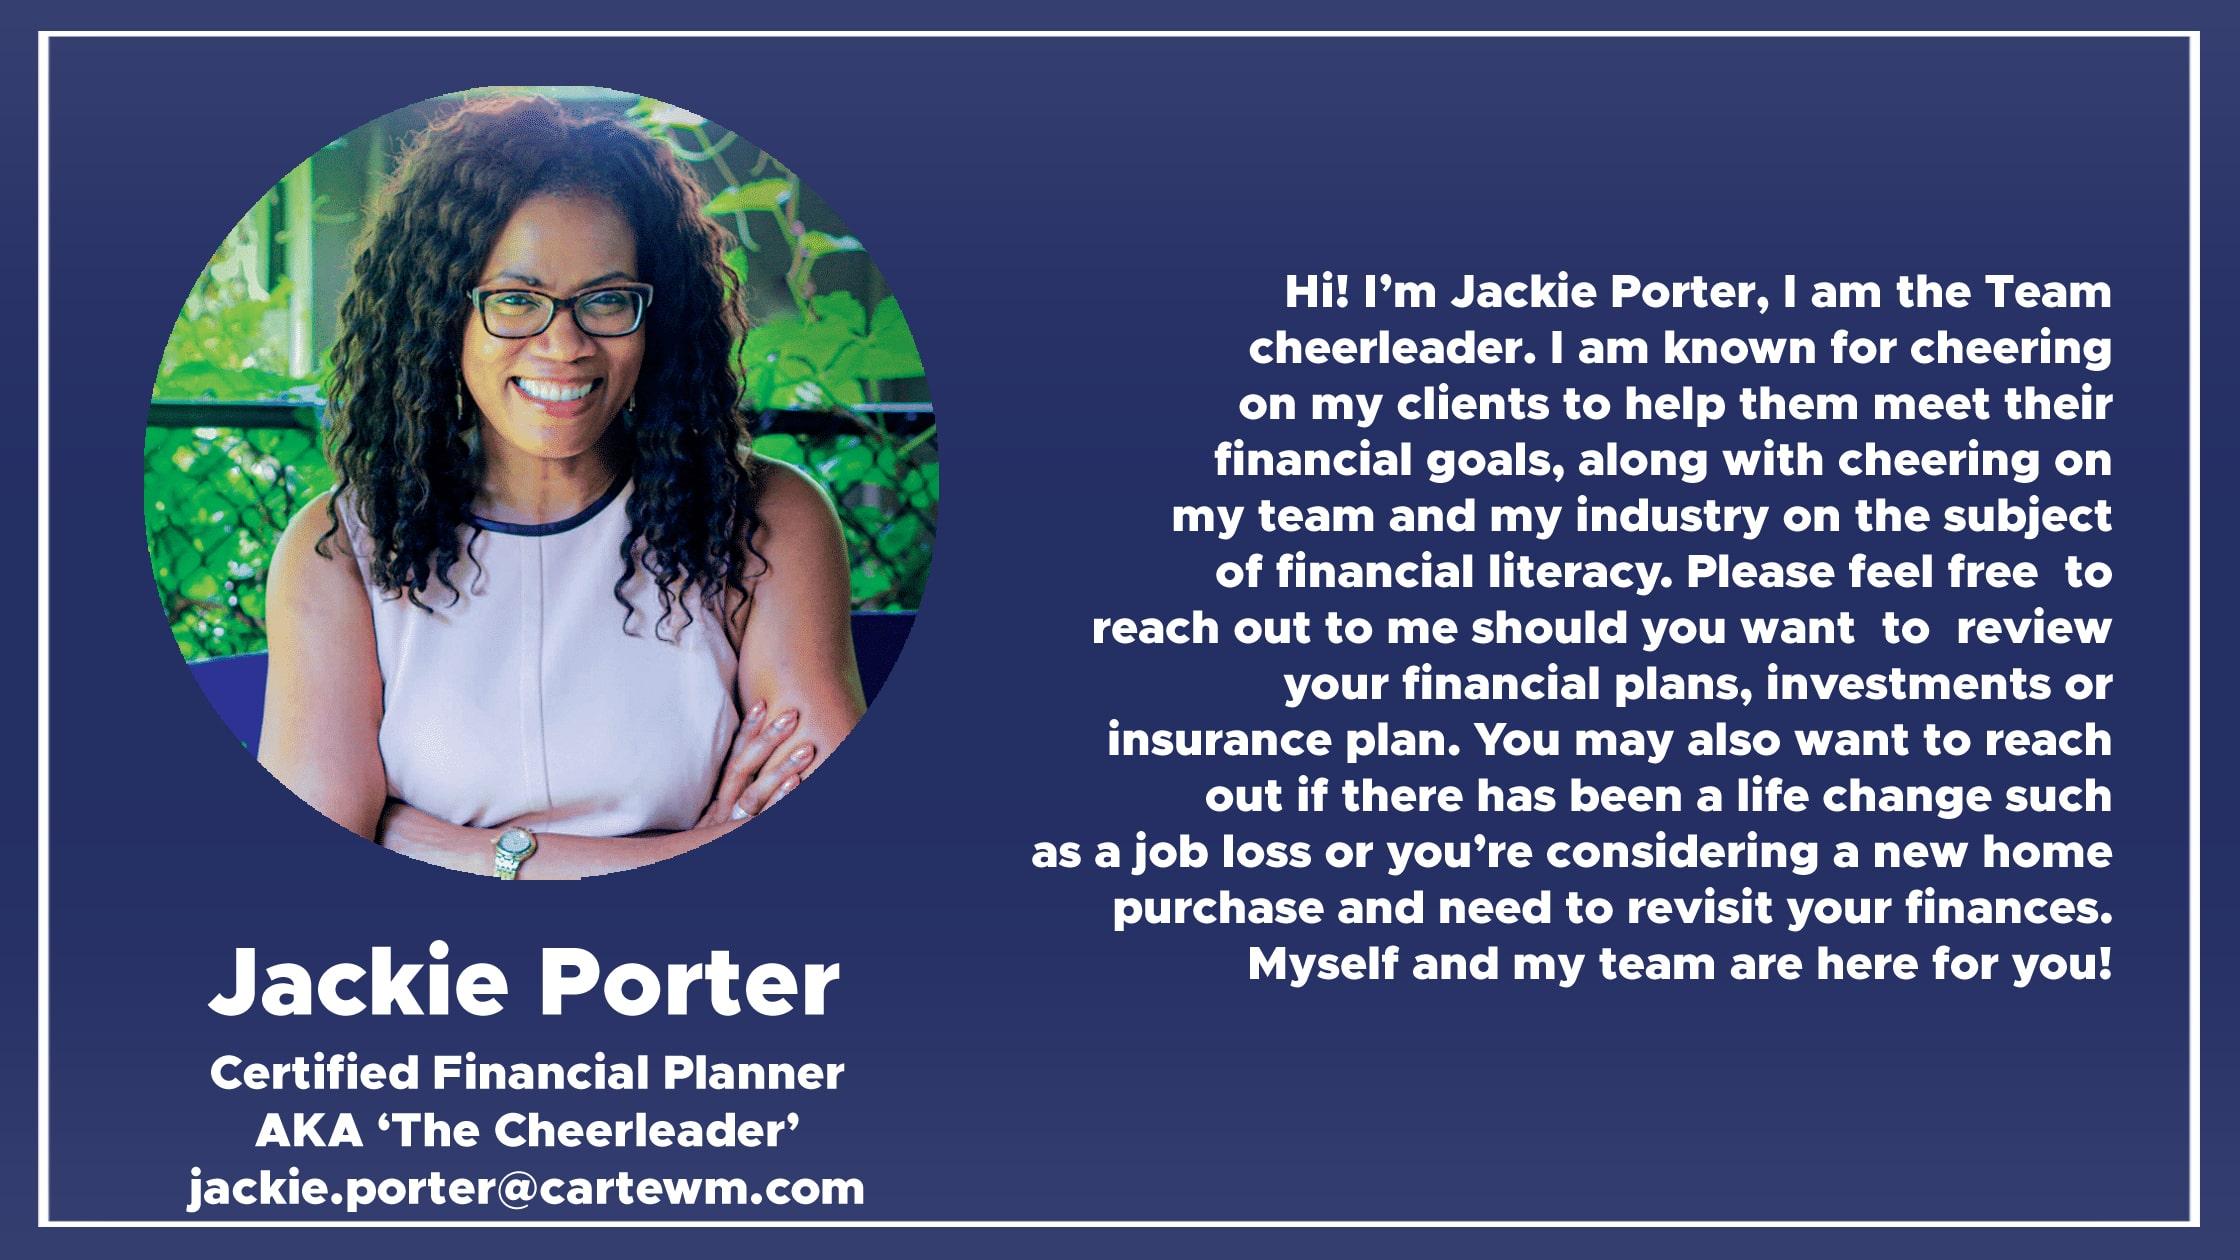 jackie porter cfp in toronto meet jackie jackie porter certified financial planner and financial advisor in toronto meet jackie